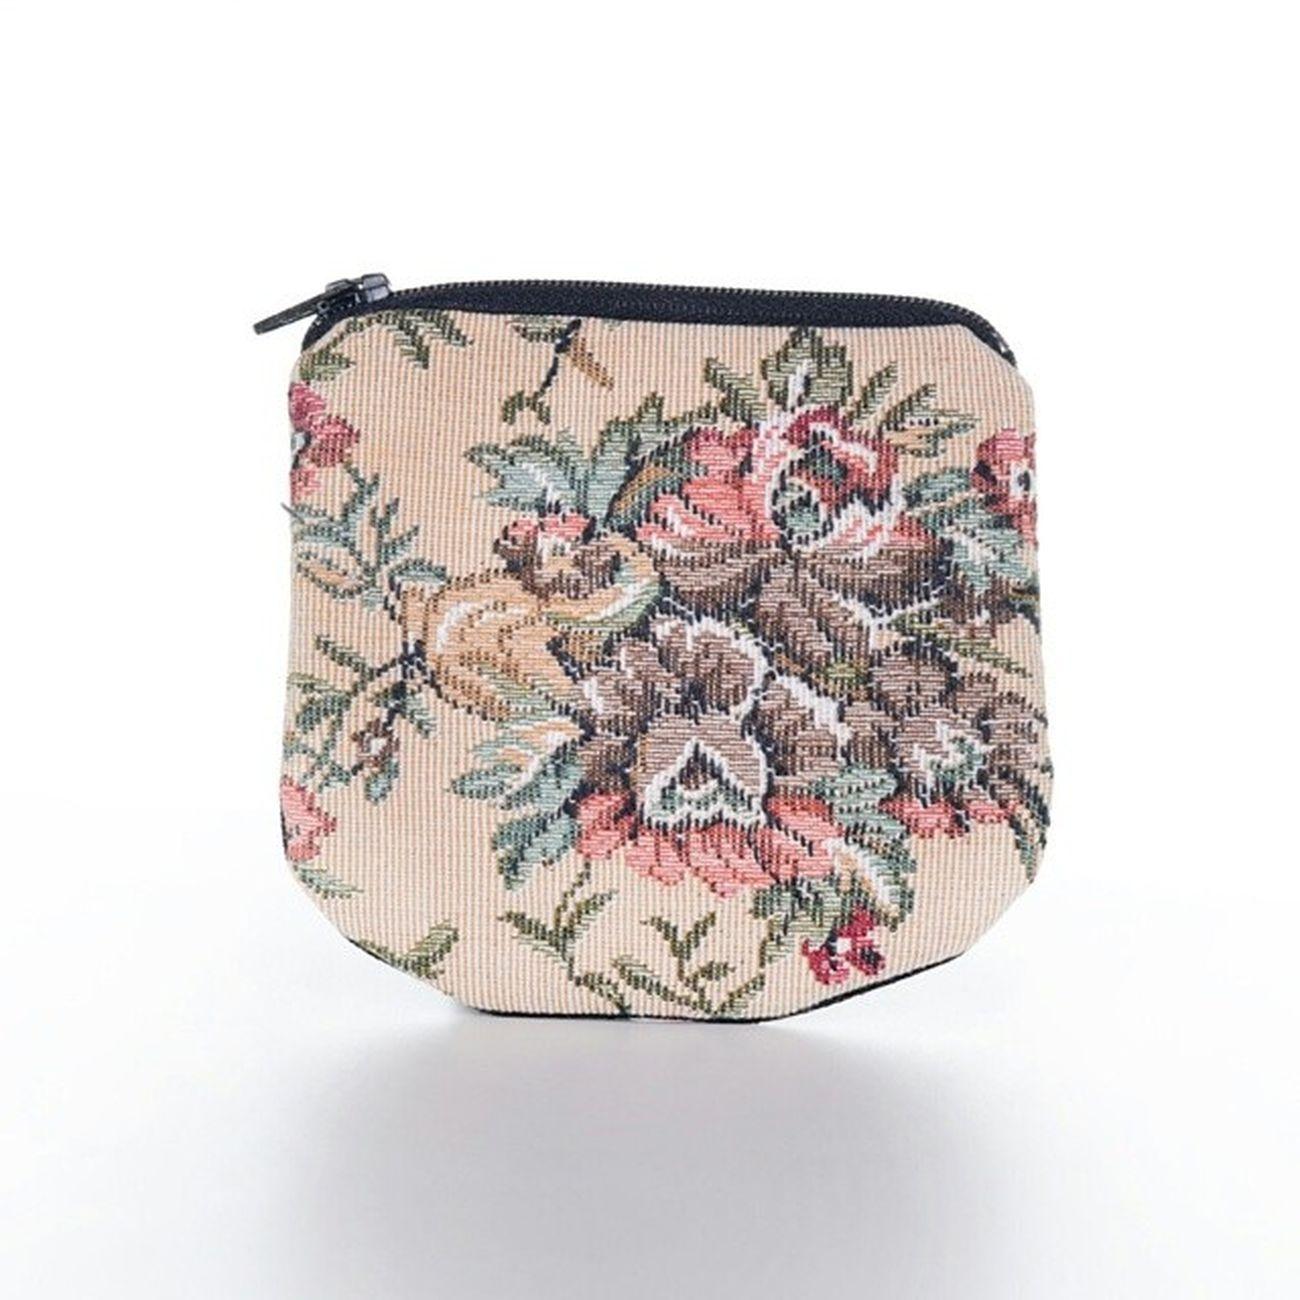 Coinpurse Tapestry Floral @miyuki @mincdesign